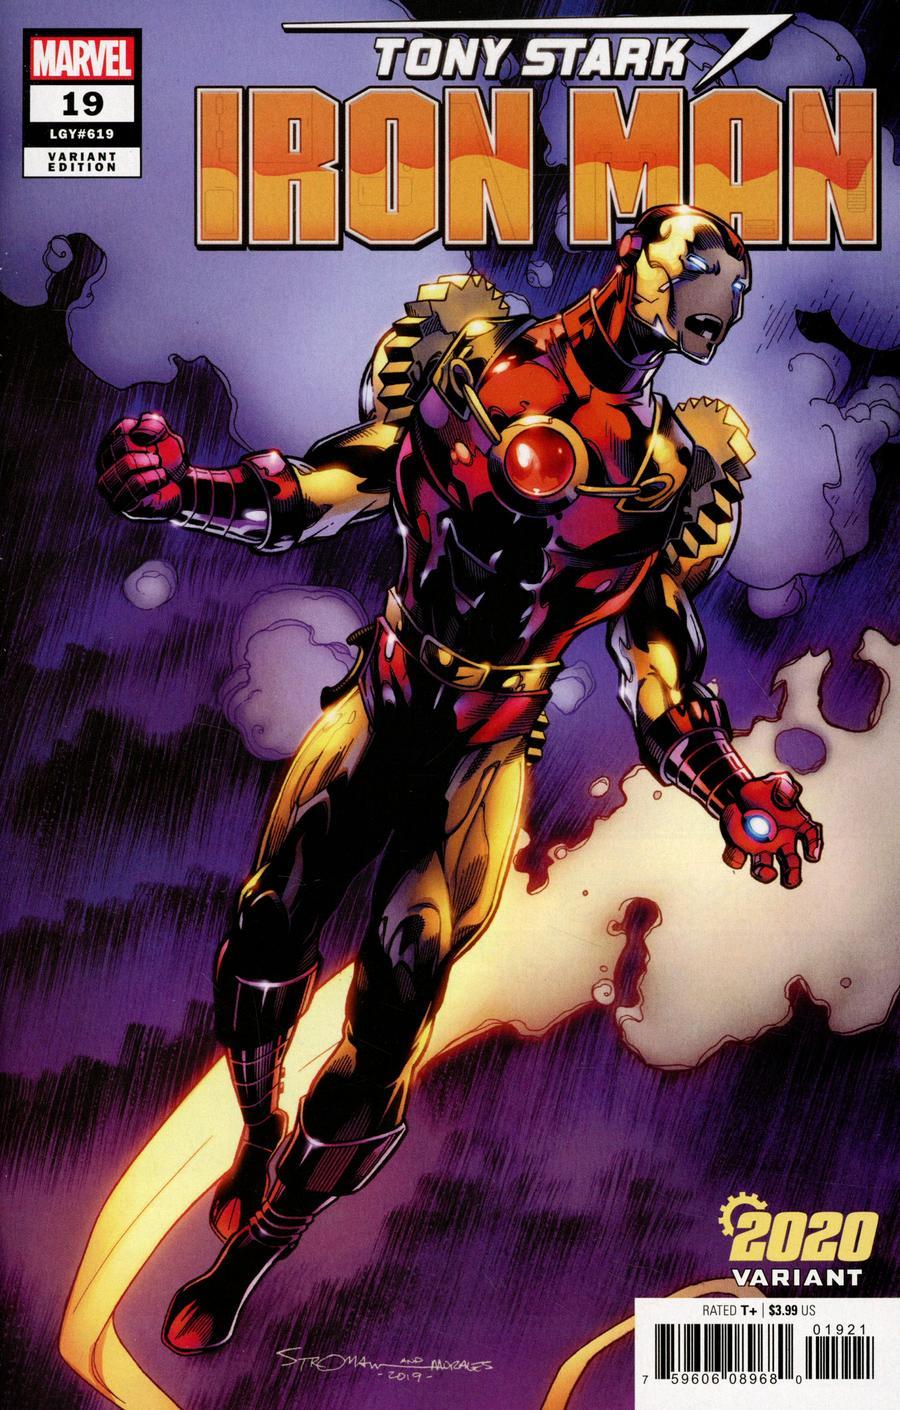 Tony Stark Iron Man #19 Cover B Variant Larry Stroman 2020 Cover